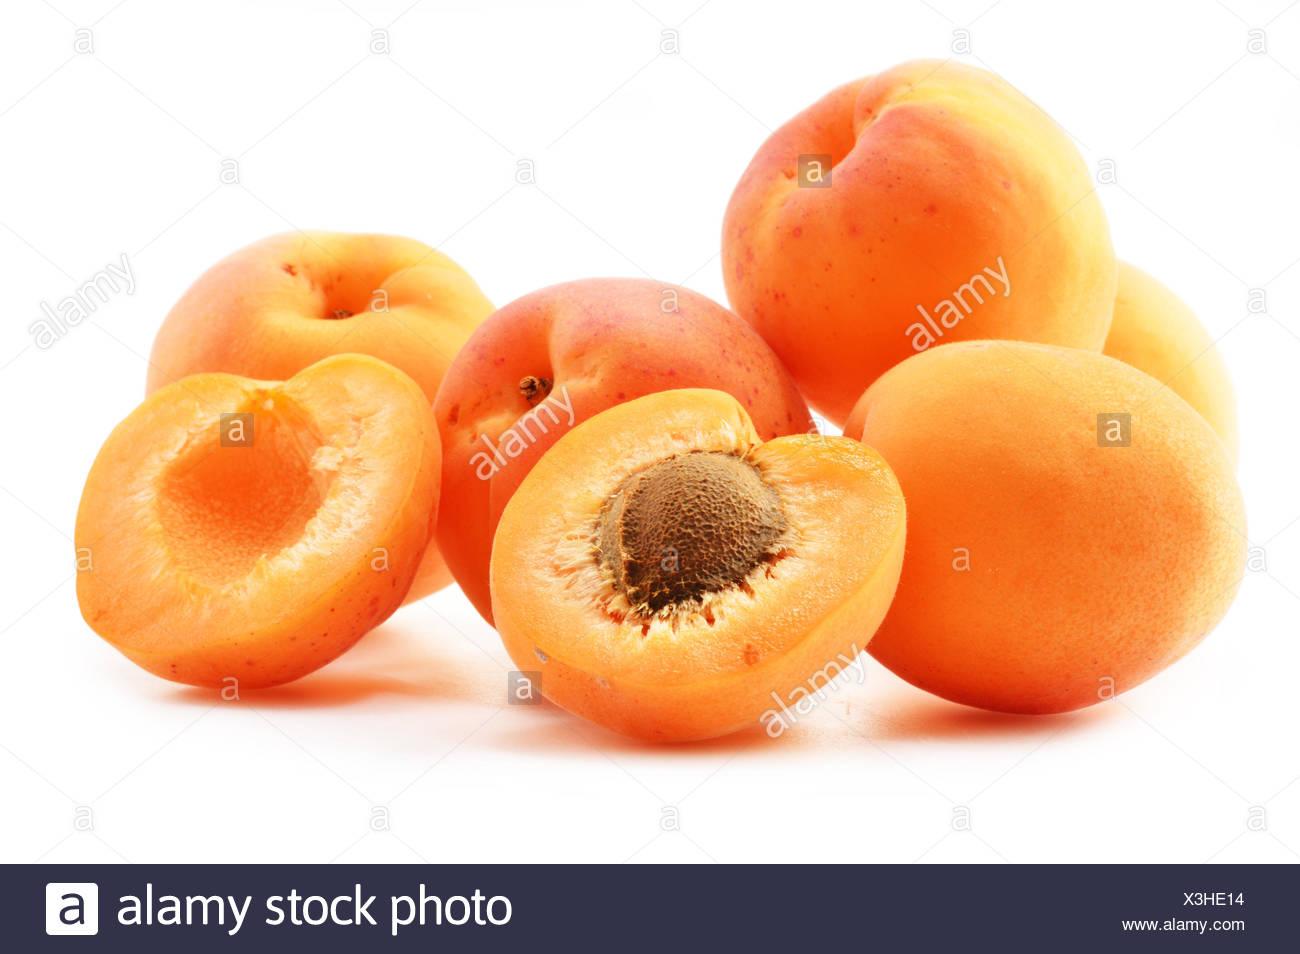 food, aliment, object, sweet, isolated, stone, ripe, fruit, shopping, kitchen, - Stock Image